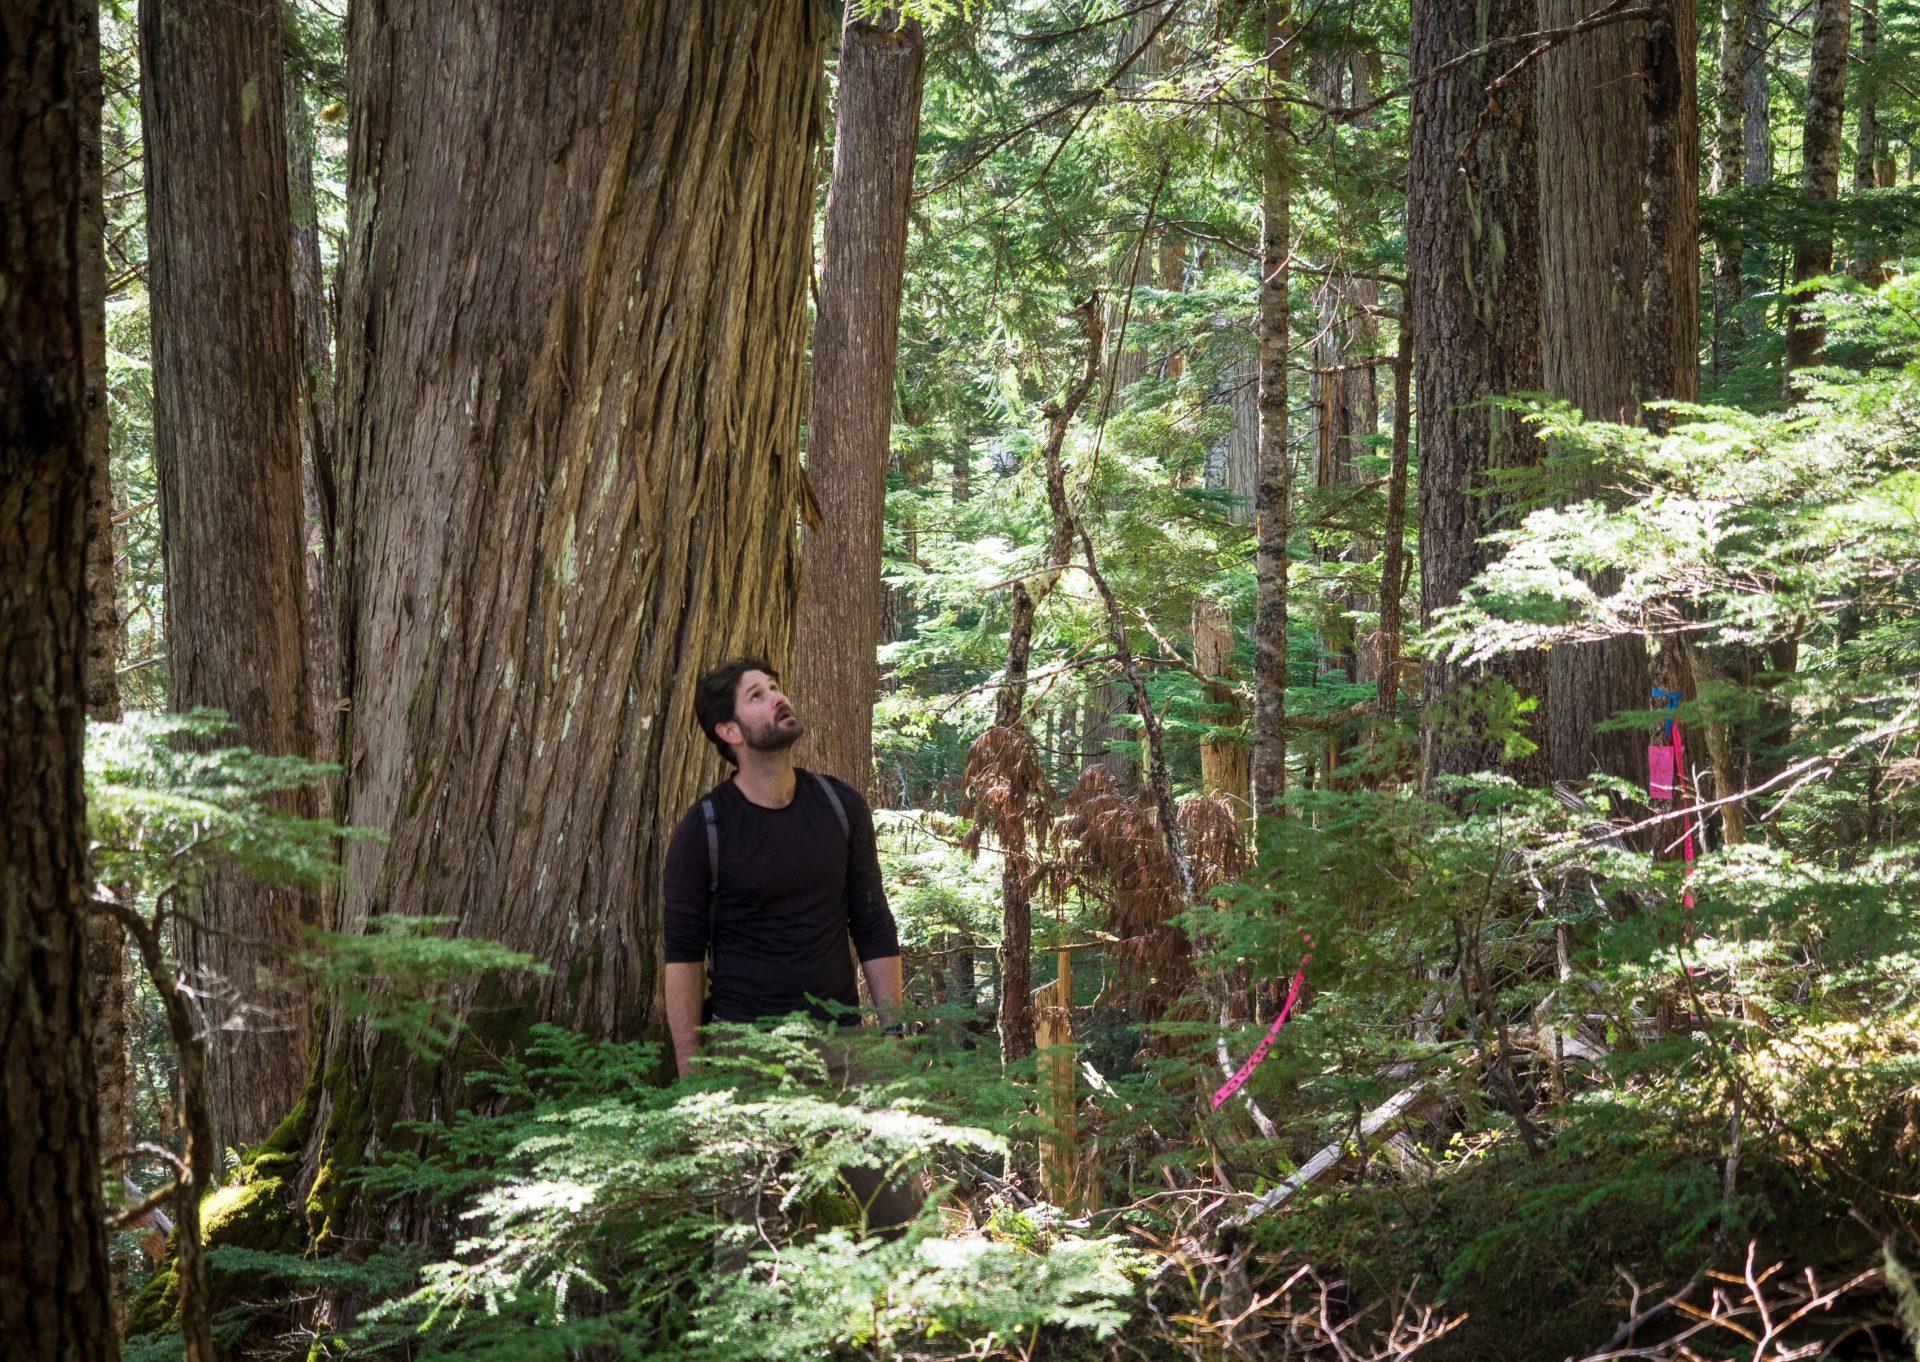 Sierra Club BC campaigner Mark Worthing